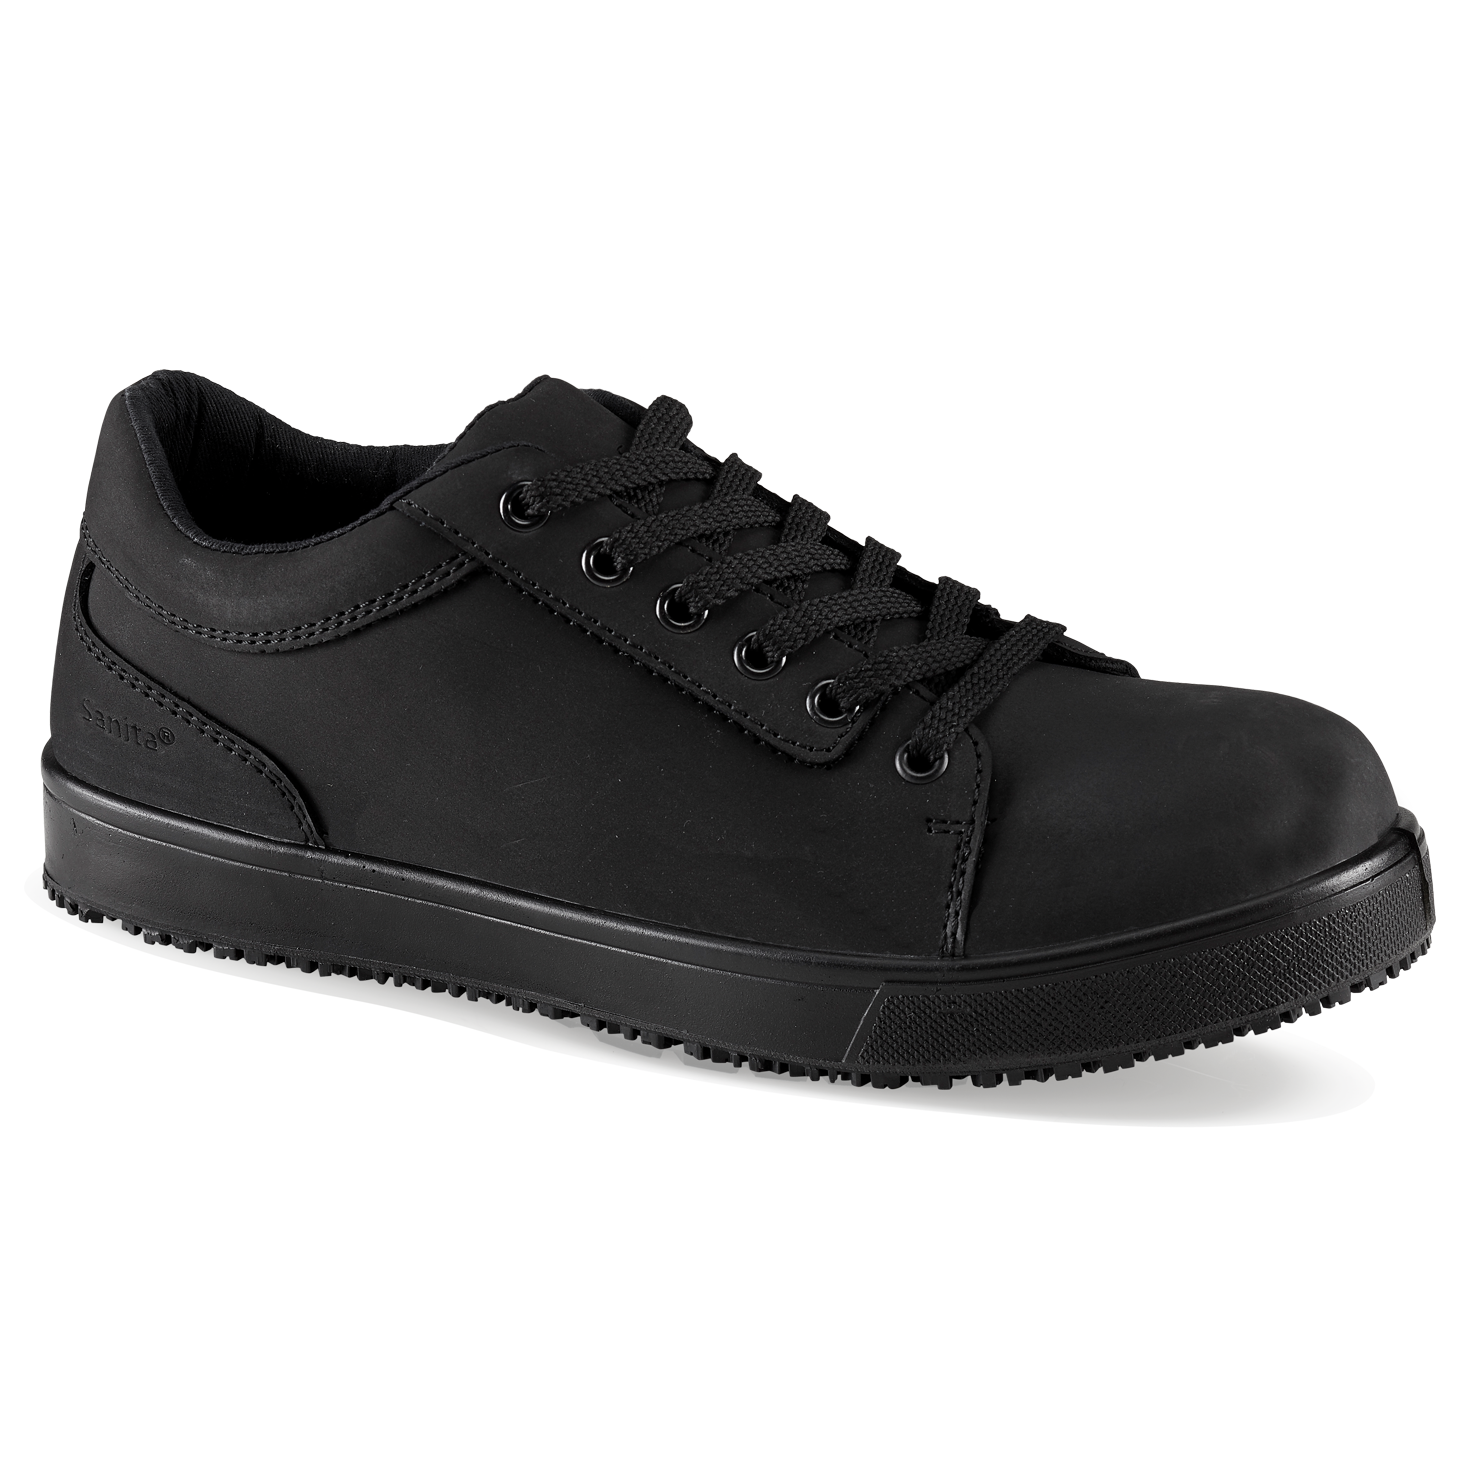 UMAMI-S2 Unisex Safety Sneaker